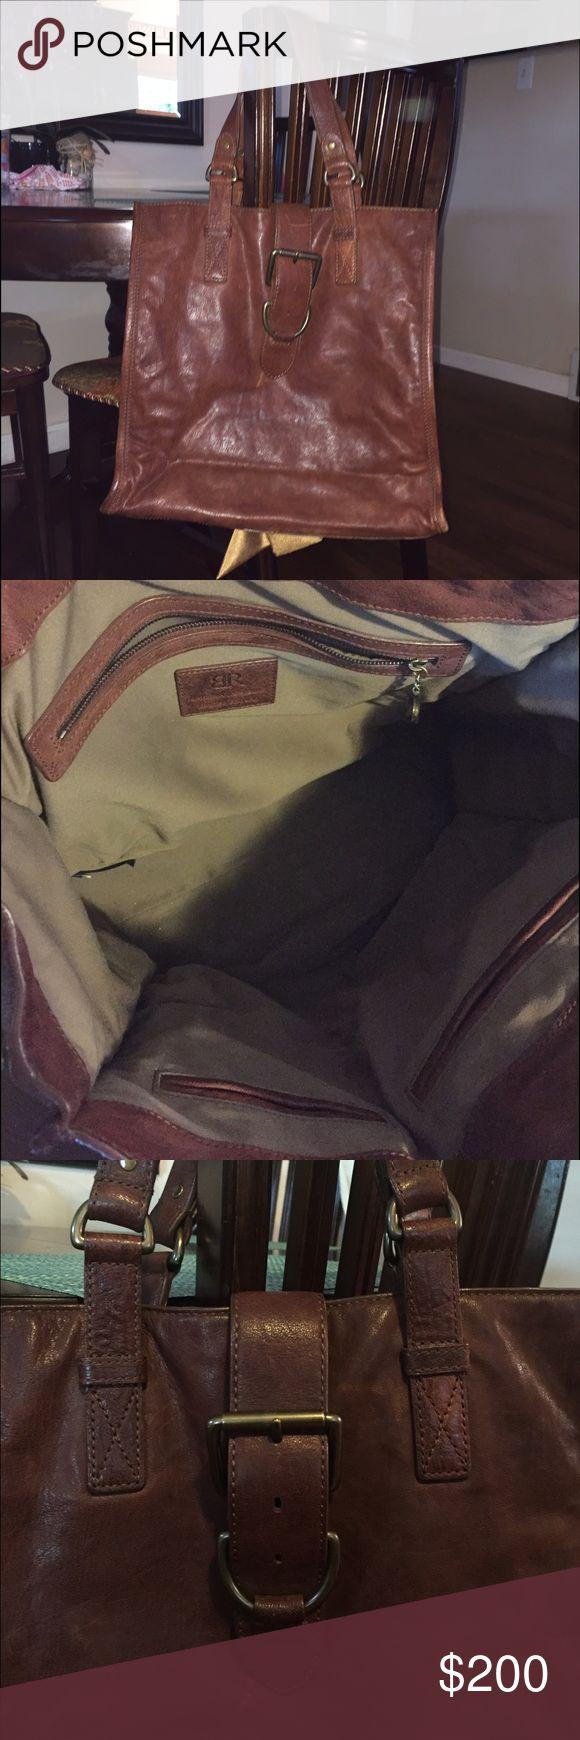 Banana Republic Leather bag Large, beautiful brown leather Banana Republic tote bag. Superb condition! 🌟 Banana Republic Bags Totes